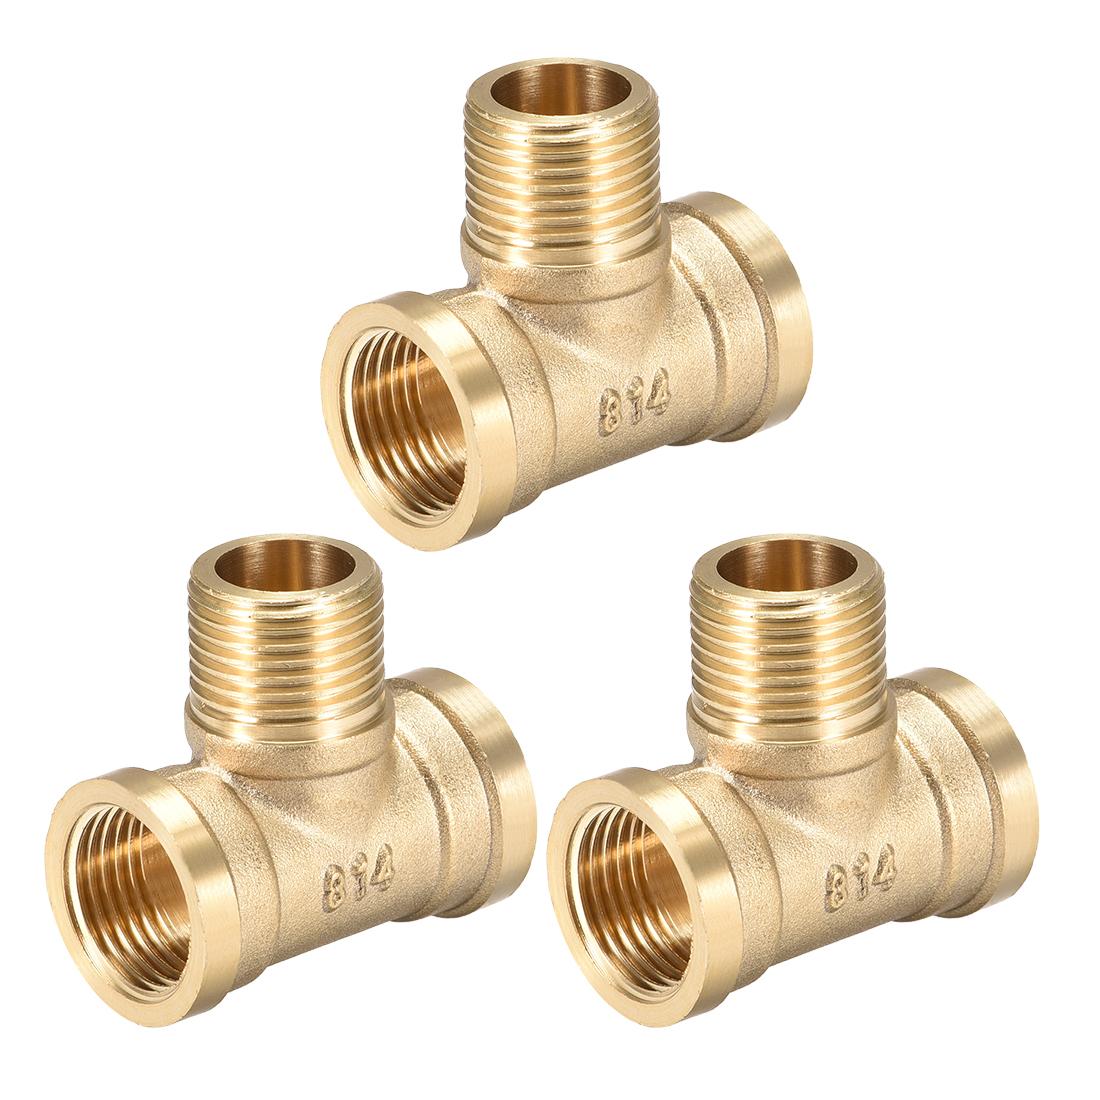 Brass Tee Pipe Fitting G1/2 FemalexG1/2 MalexG1/2 Female T Shaped Connector 3pcs